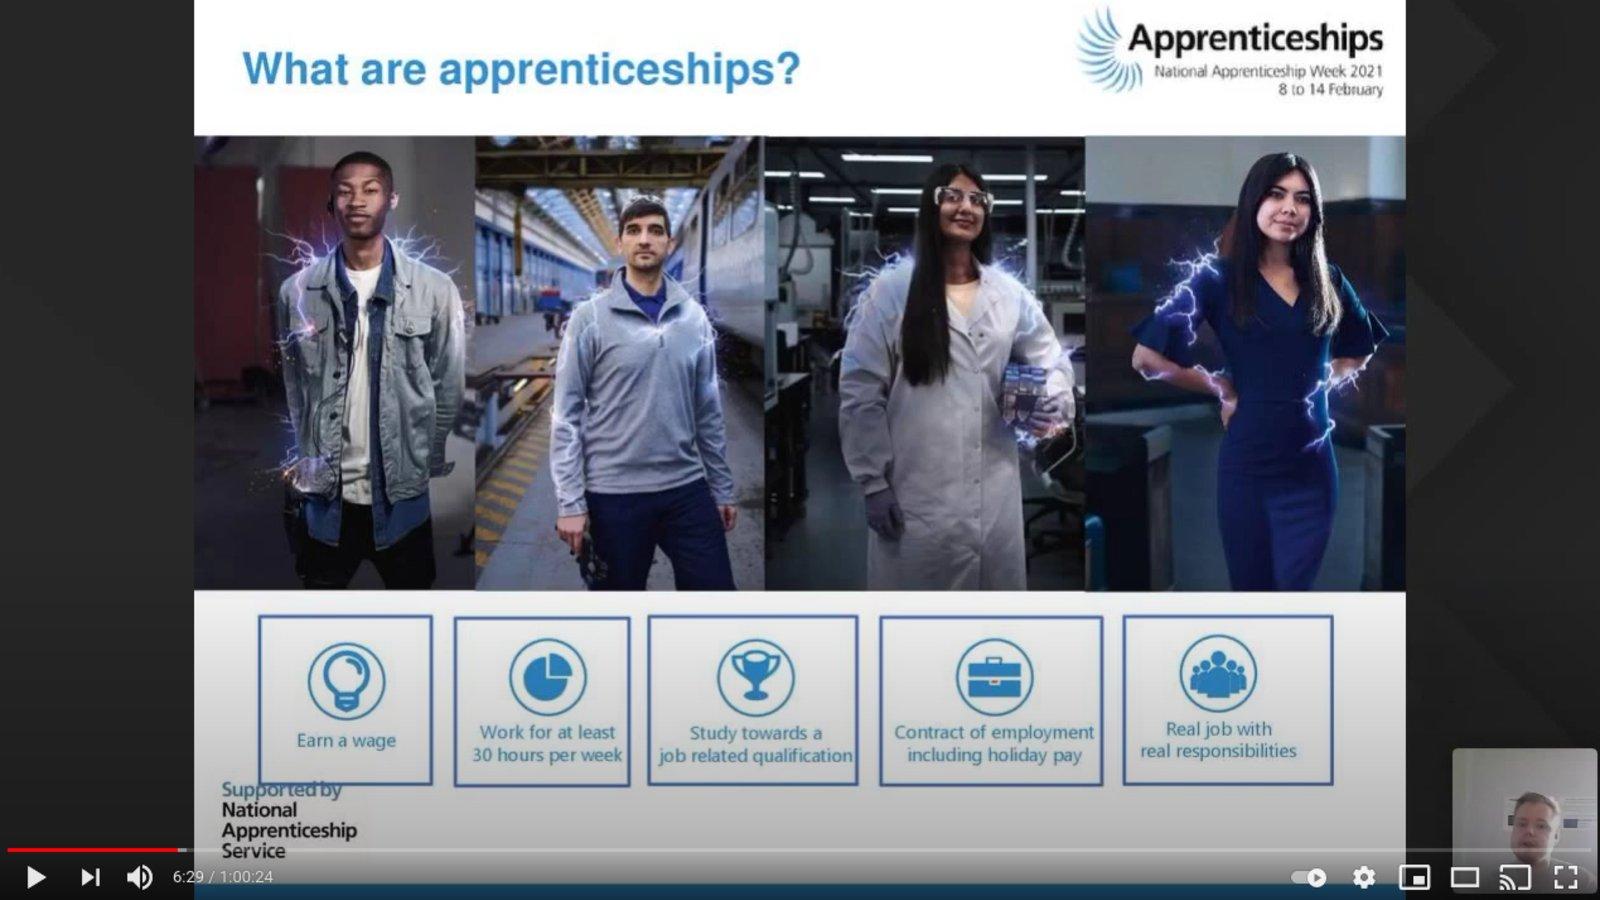 Department for Education Apprenticeships